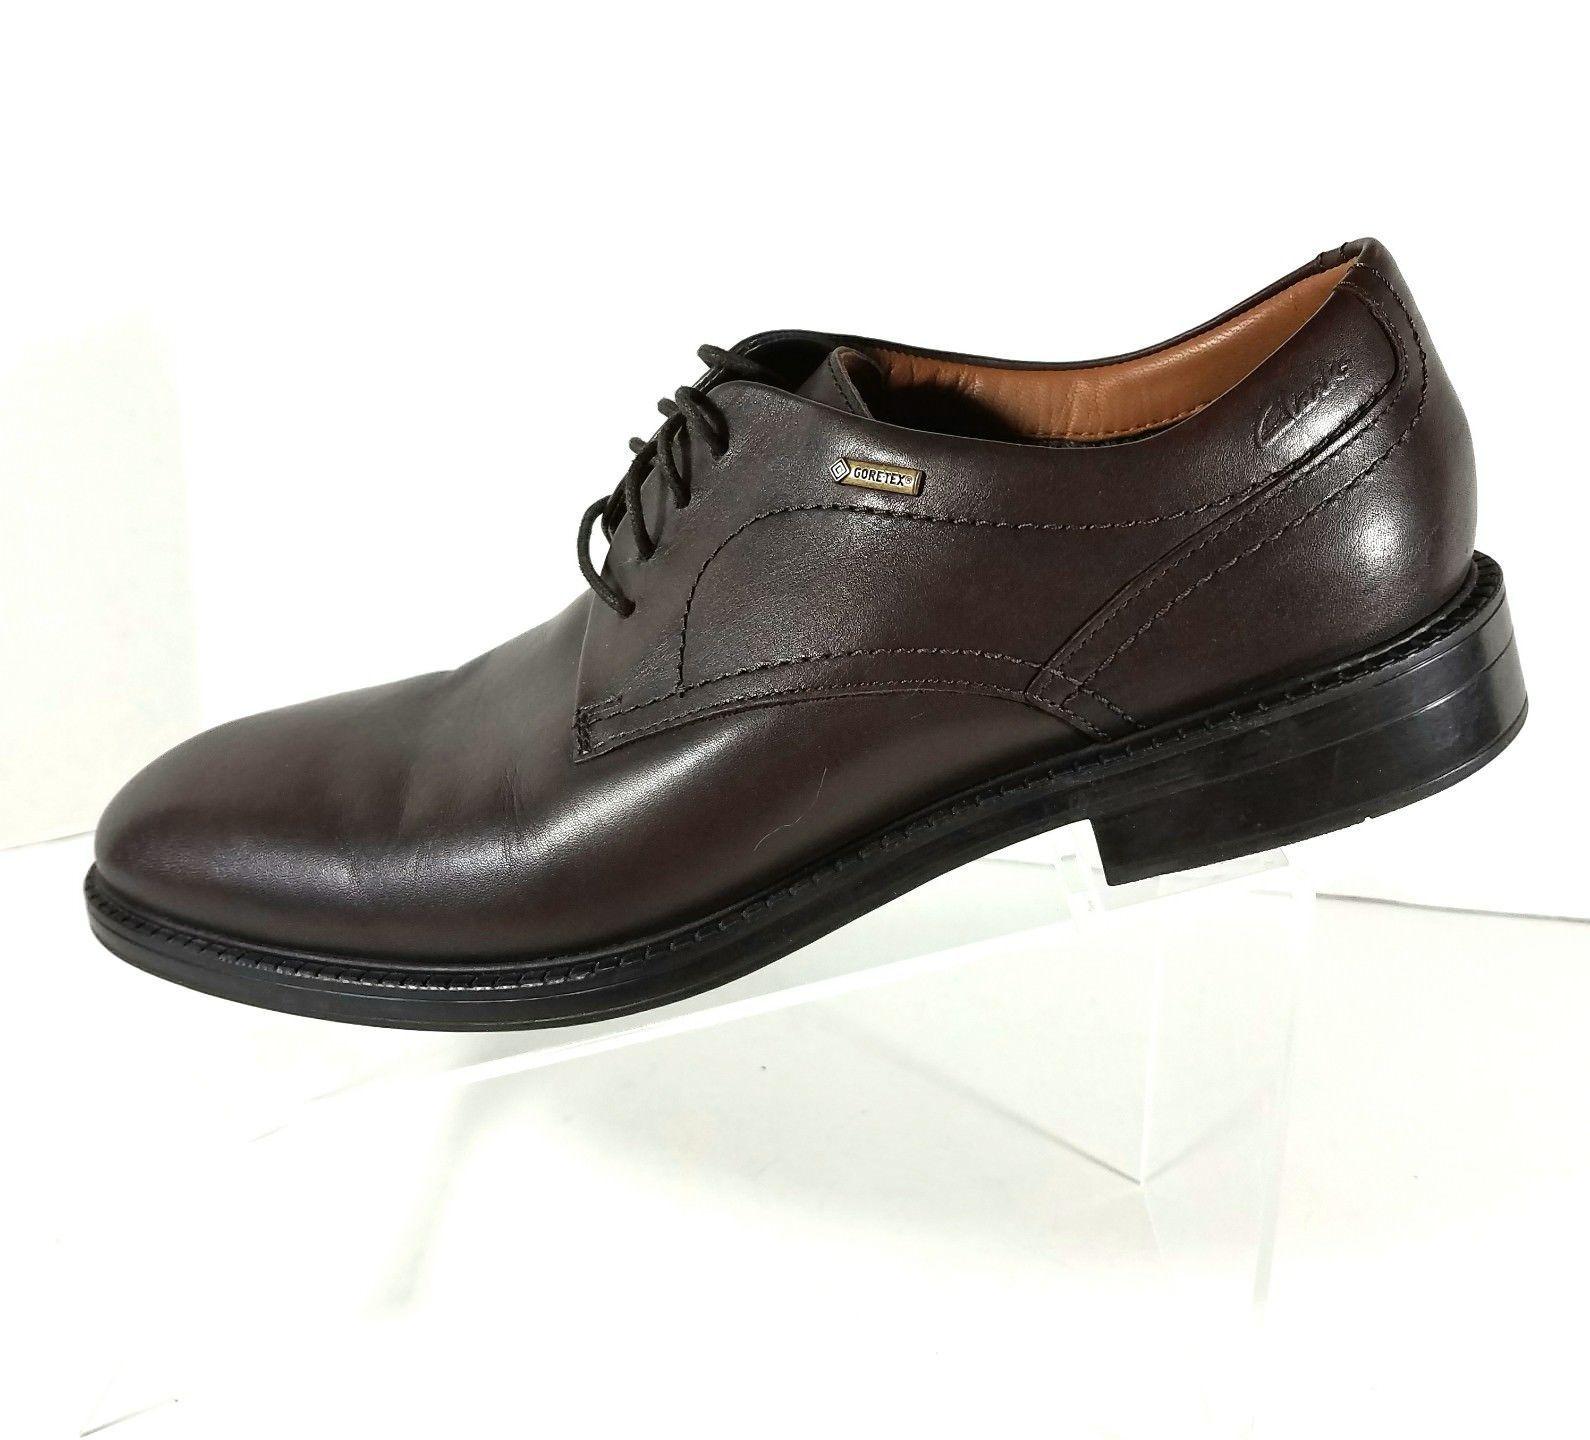 Clarks Chilver Walk Gore-Tex Derby Shoes Oxfords Men's Size 8.5M Brown 26109690